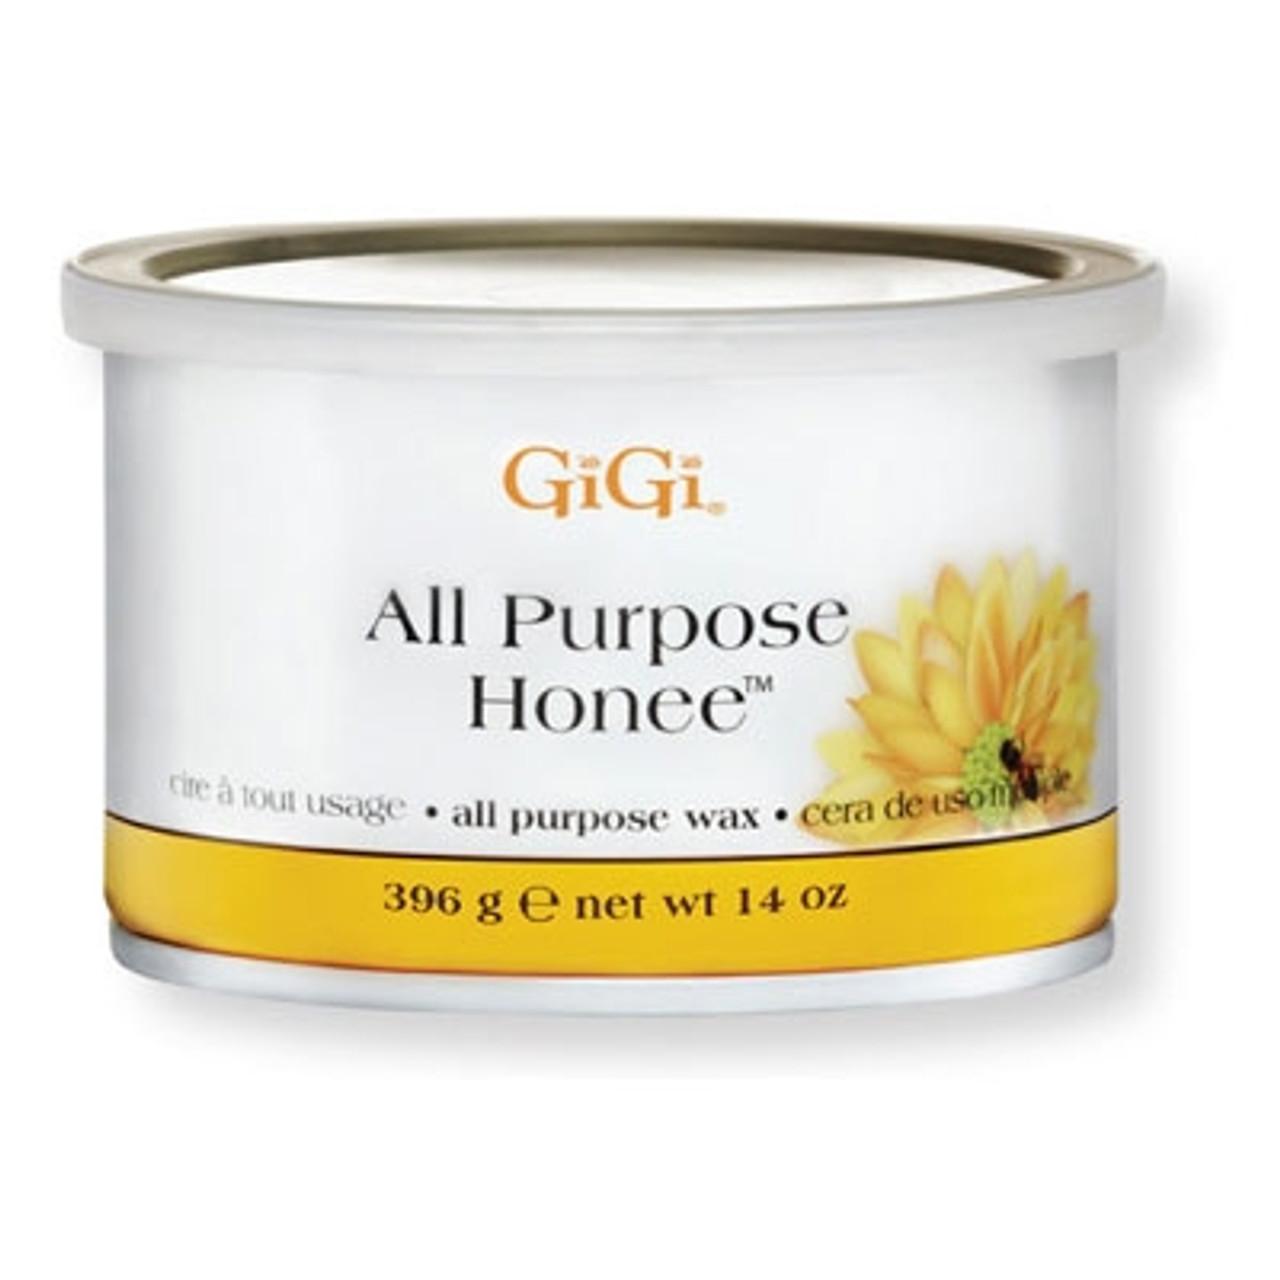 GiGi All Purpose Honee